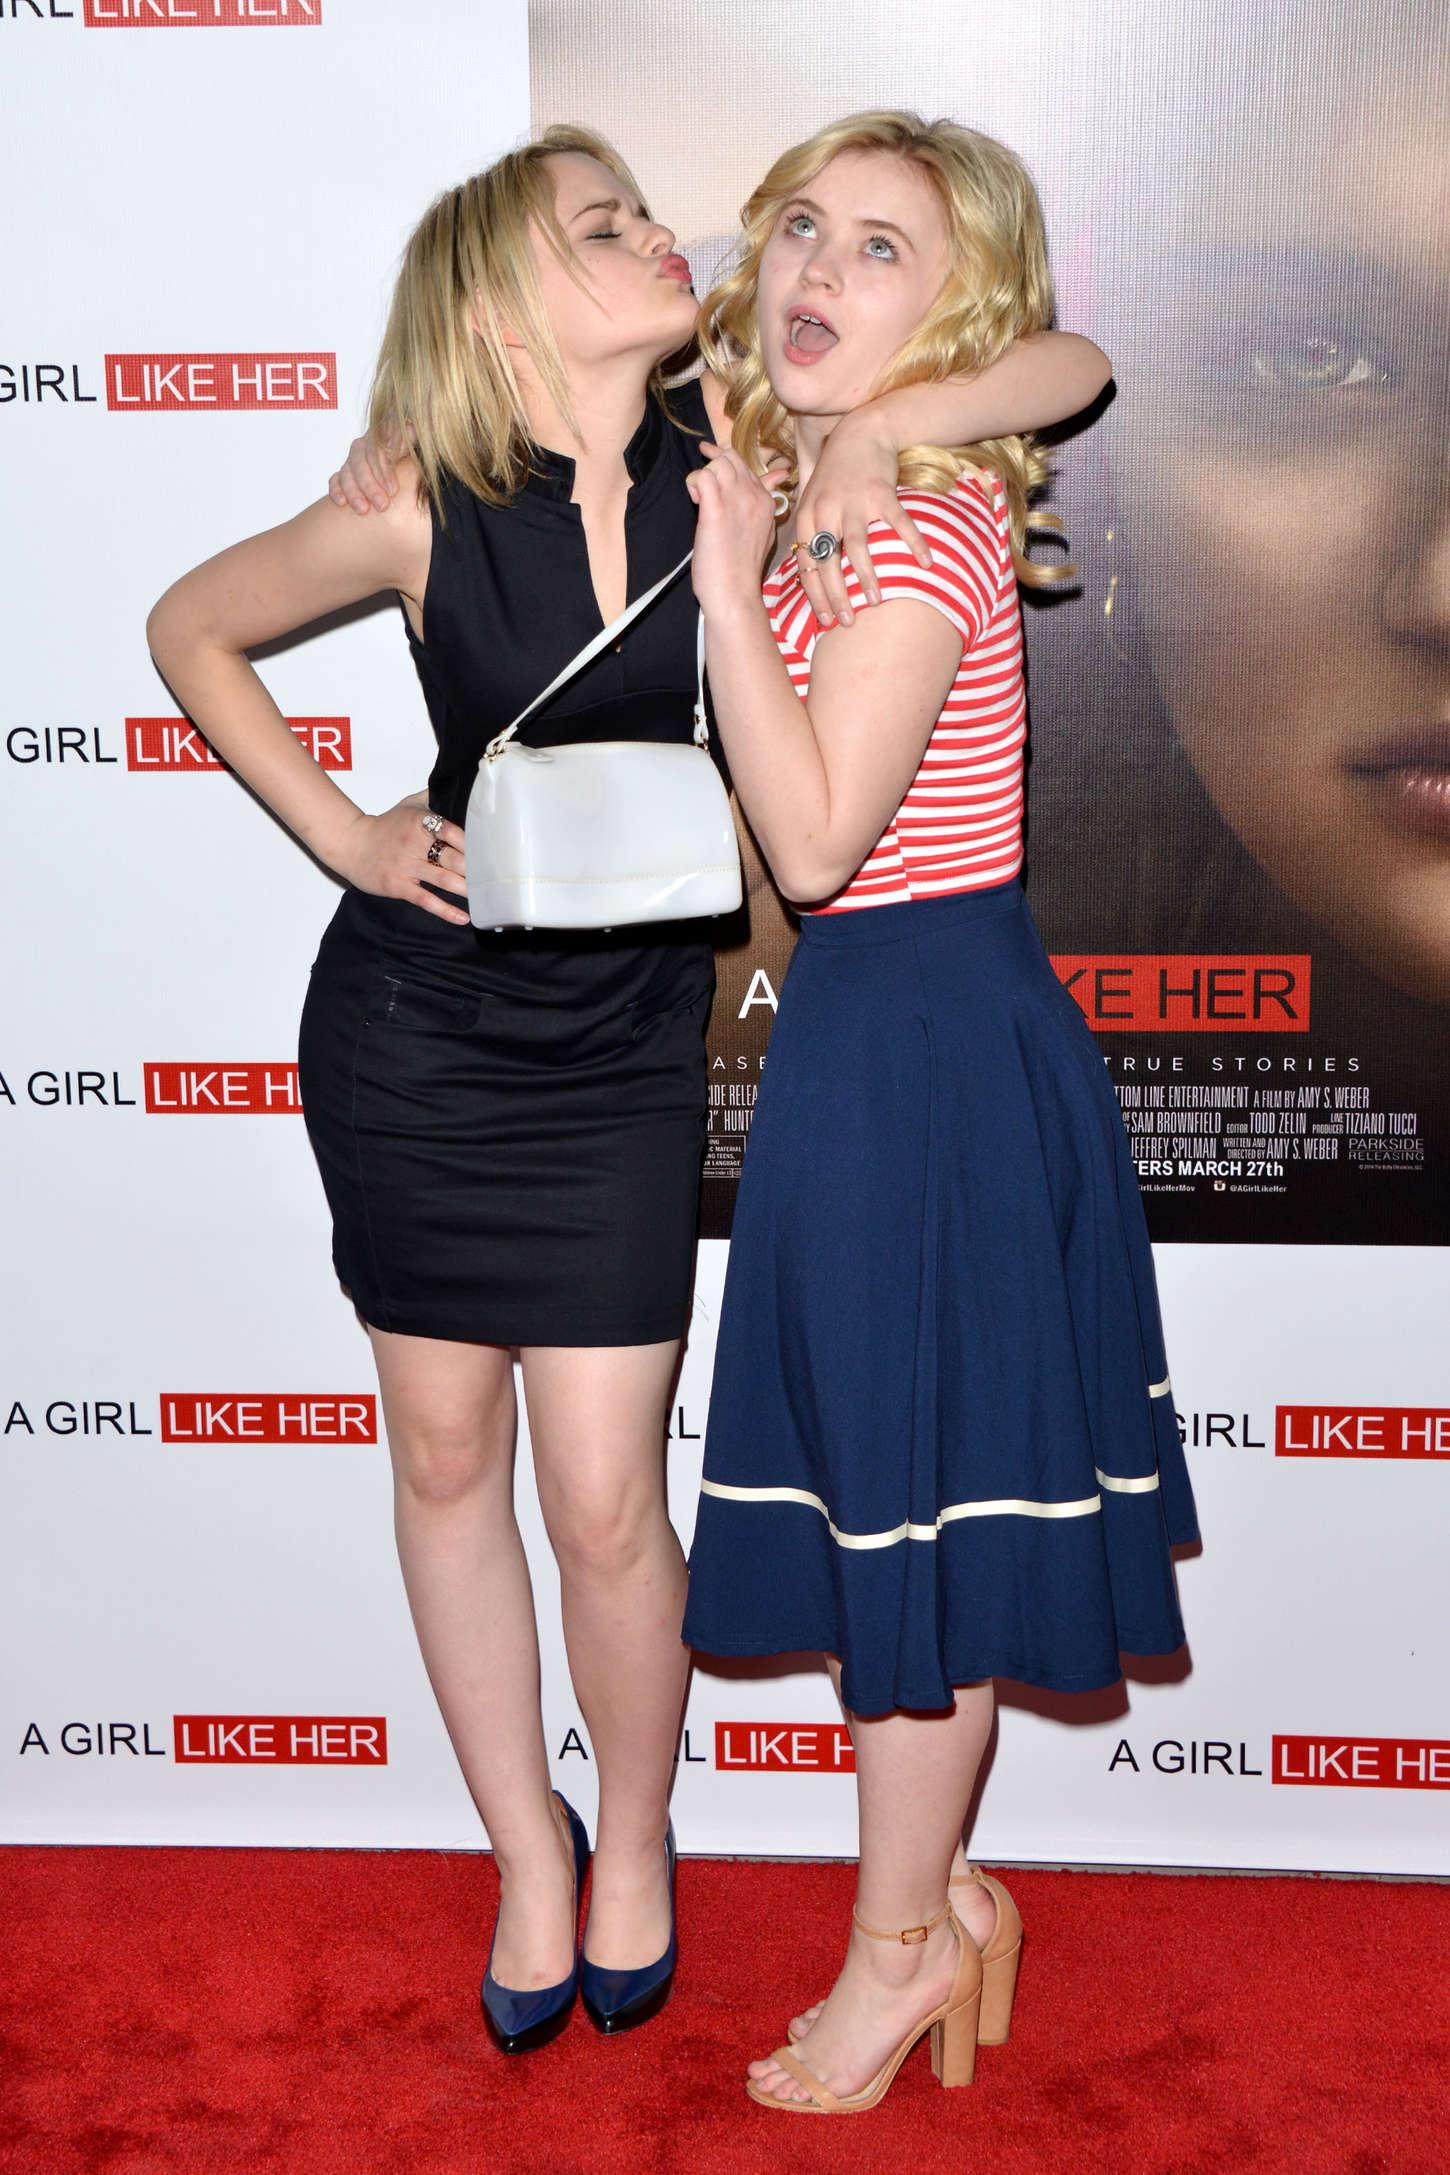 Sierra McCormick : A Girl Like Her Premiere -09 – GotCeleb